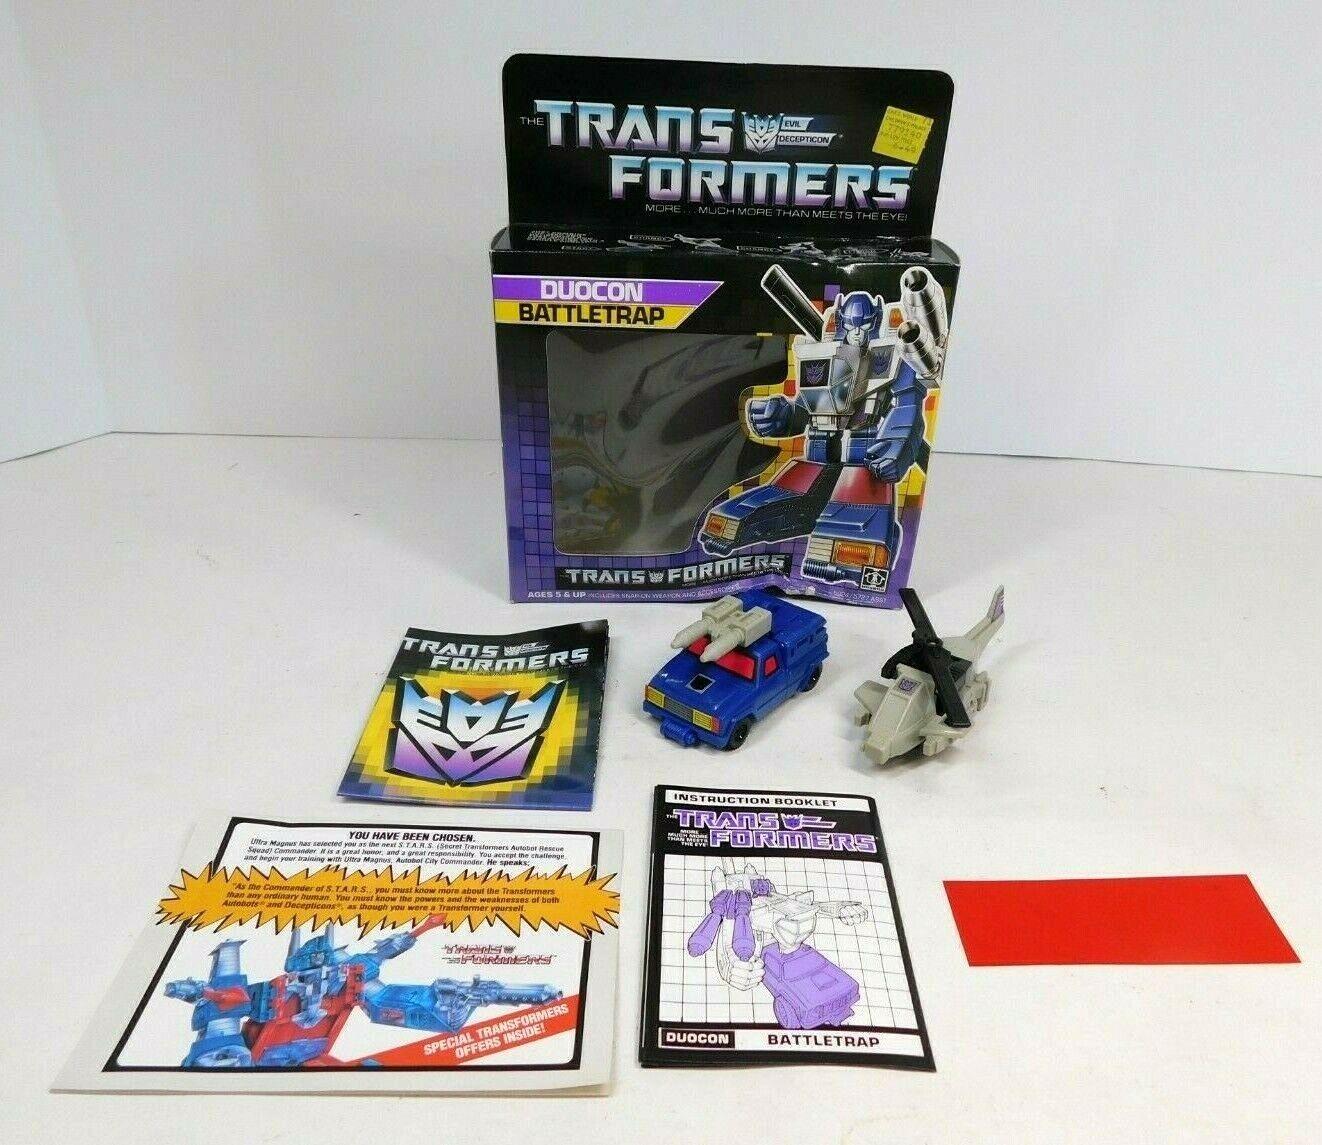 Transformers G1 duocon battletrap completo con caja, papeles 1987 Hasbro